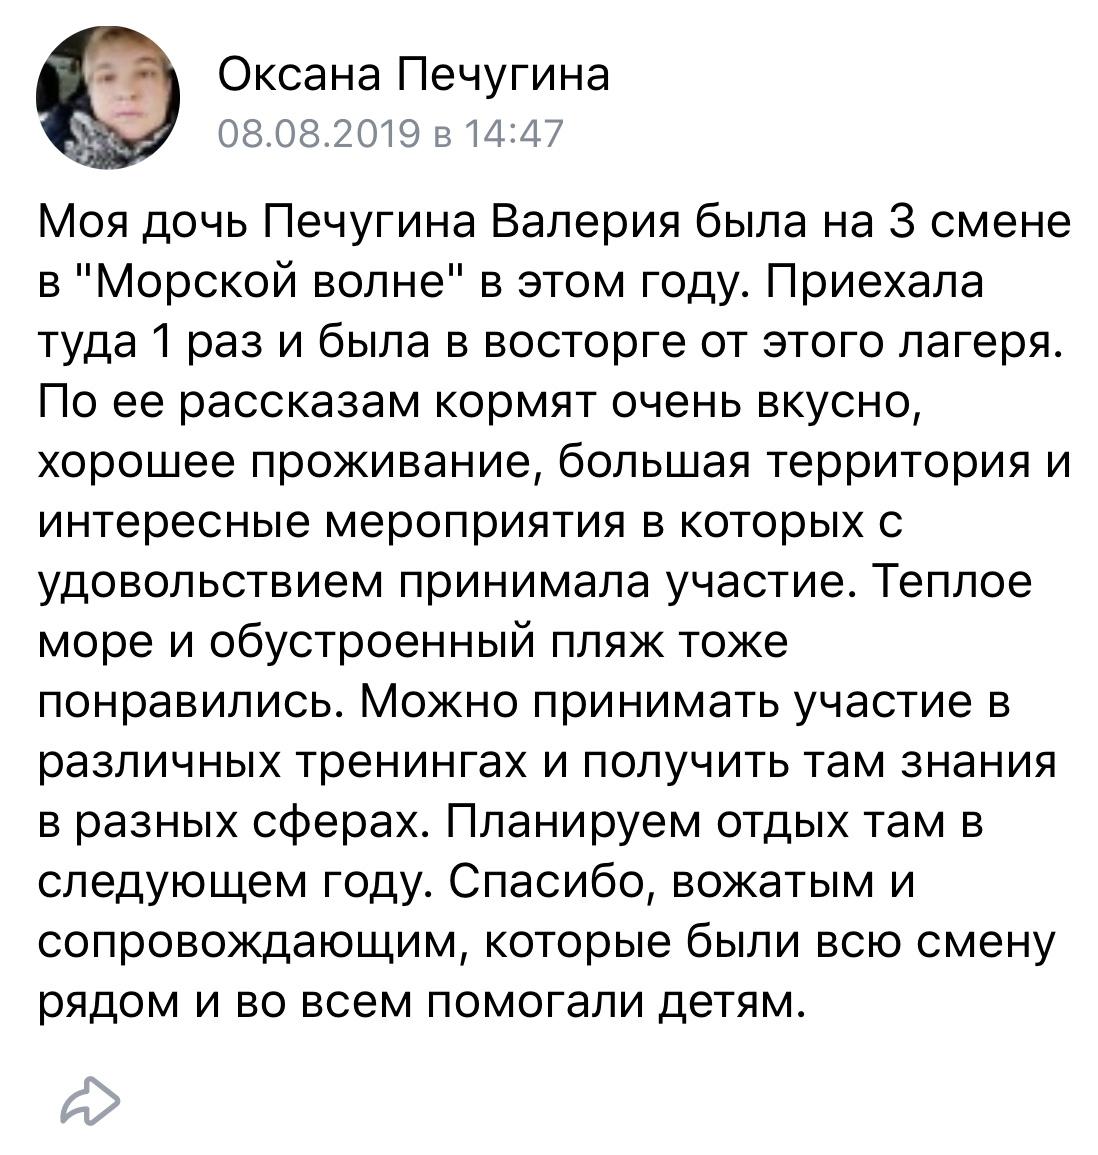 Отзыв Оксана Пичугина о Пилигрим Плюс